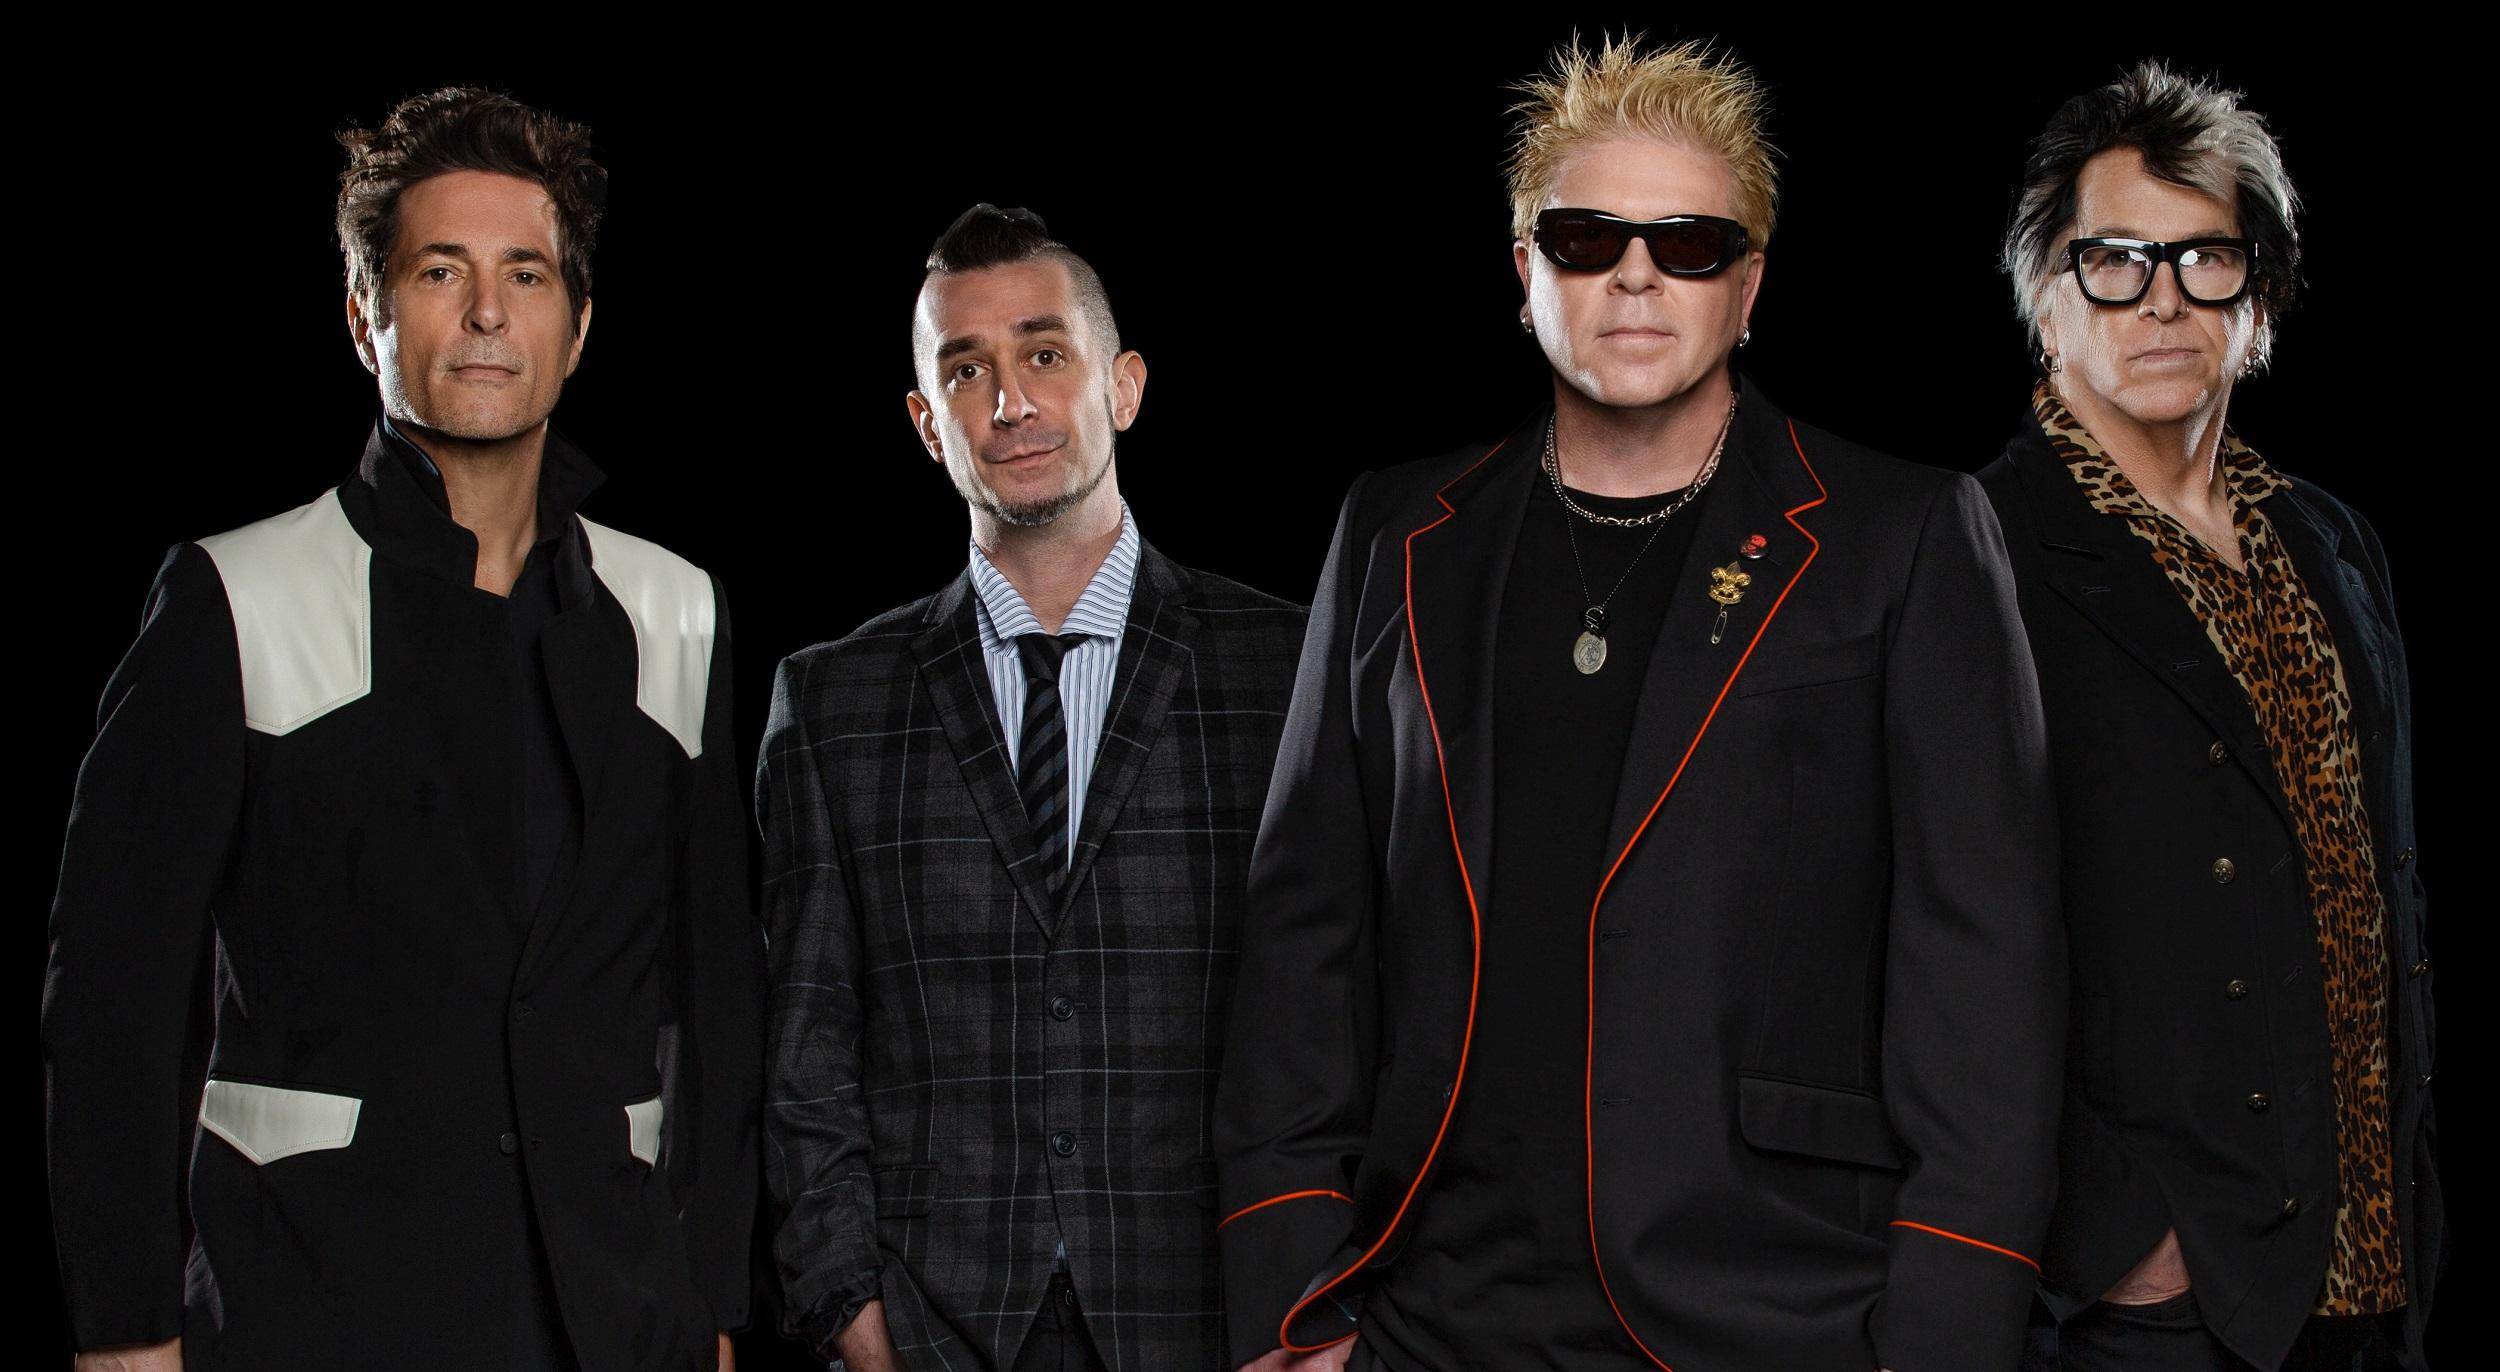 """Let The Bad Time Roll"": The Offspring presenta su nuevo álbum — Cristobal Eujanian"